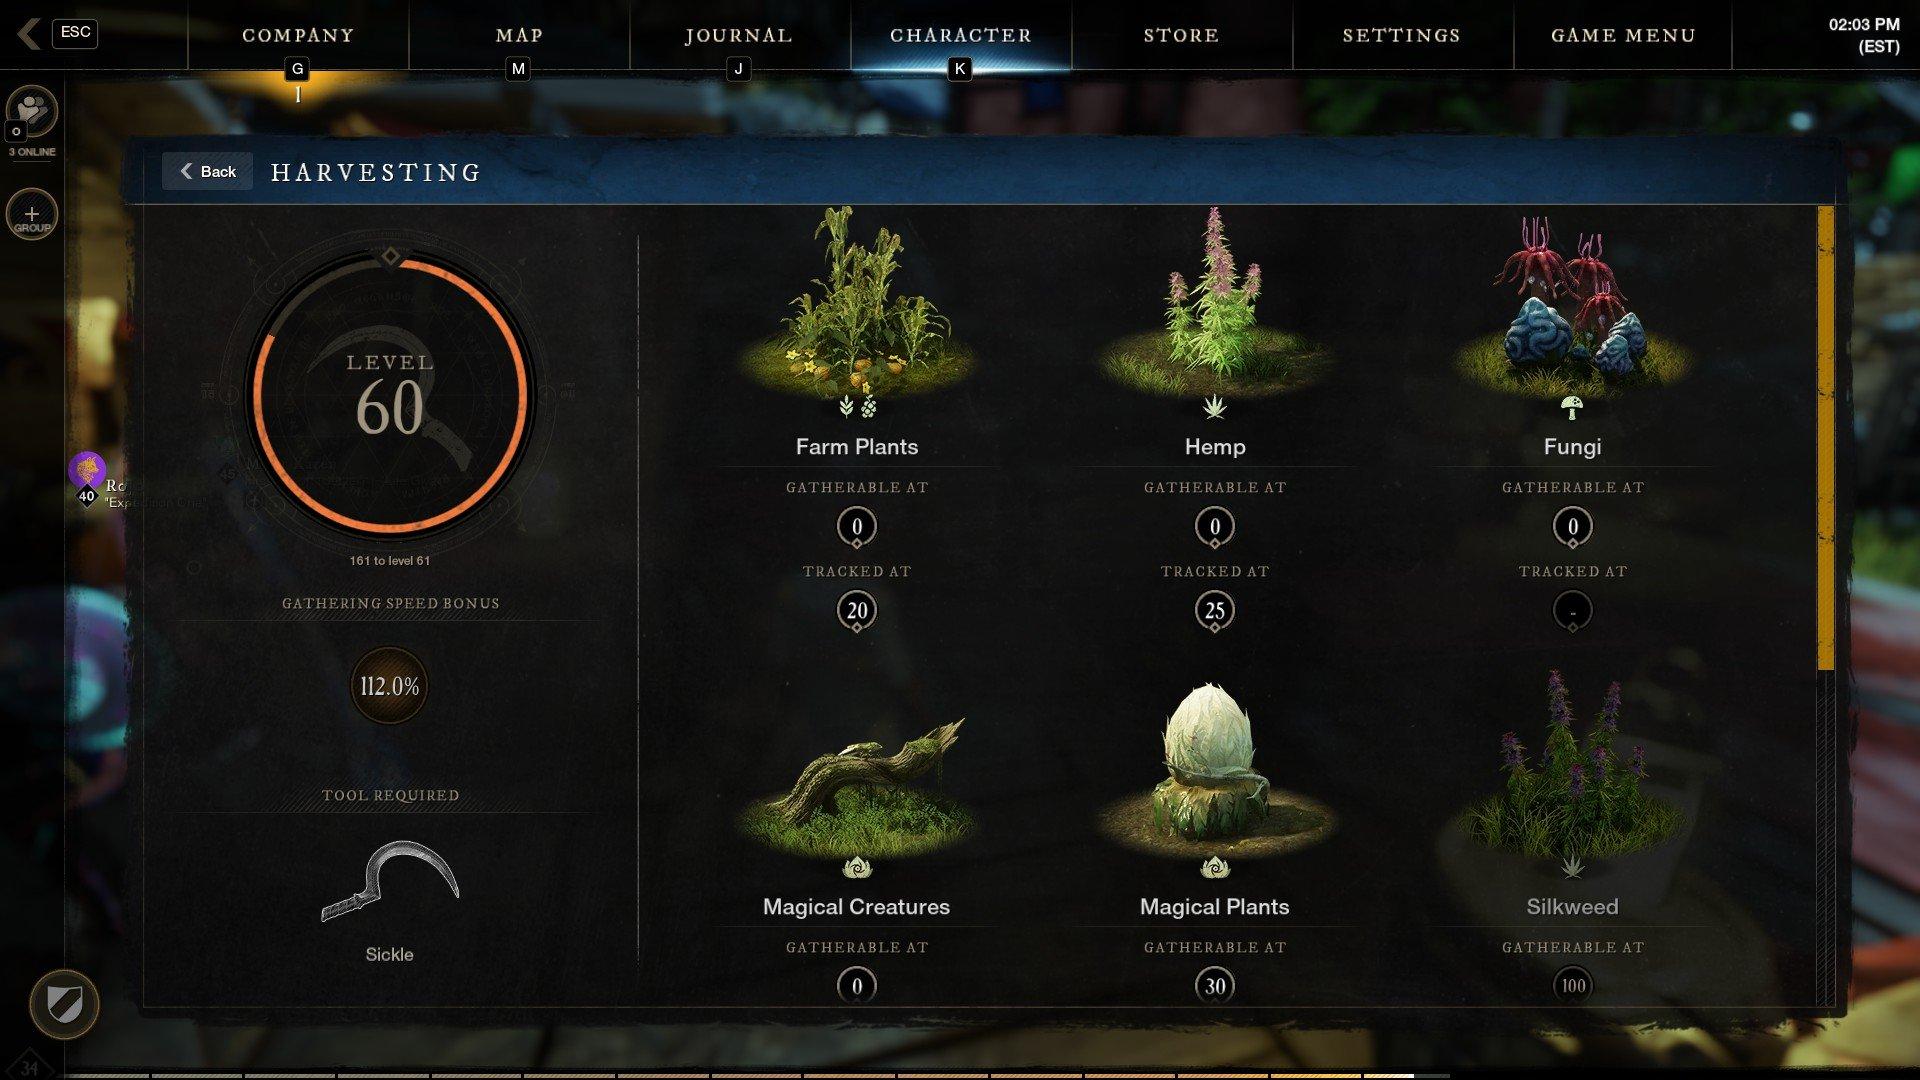 New World - Harvesting Plant Tracking